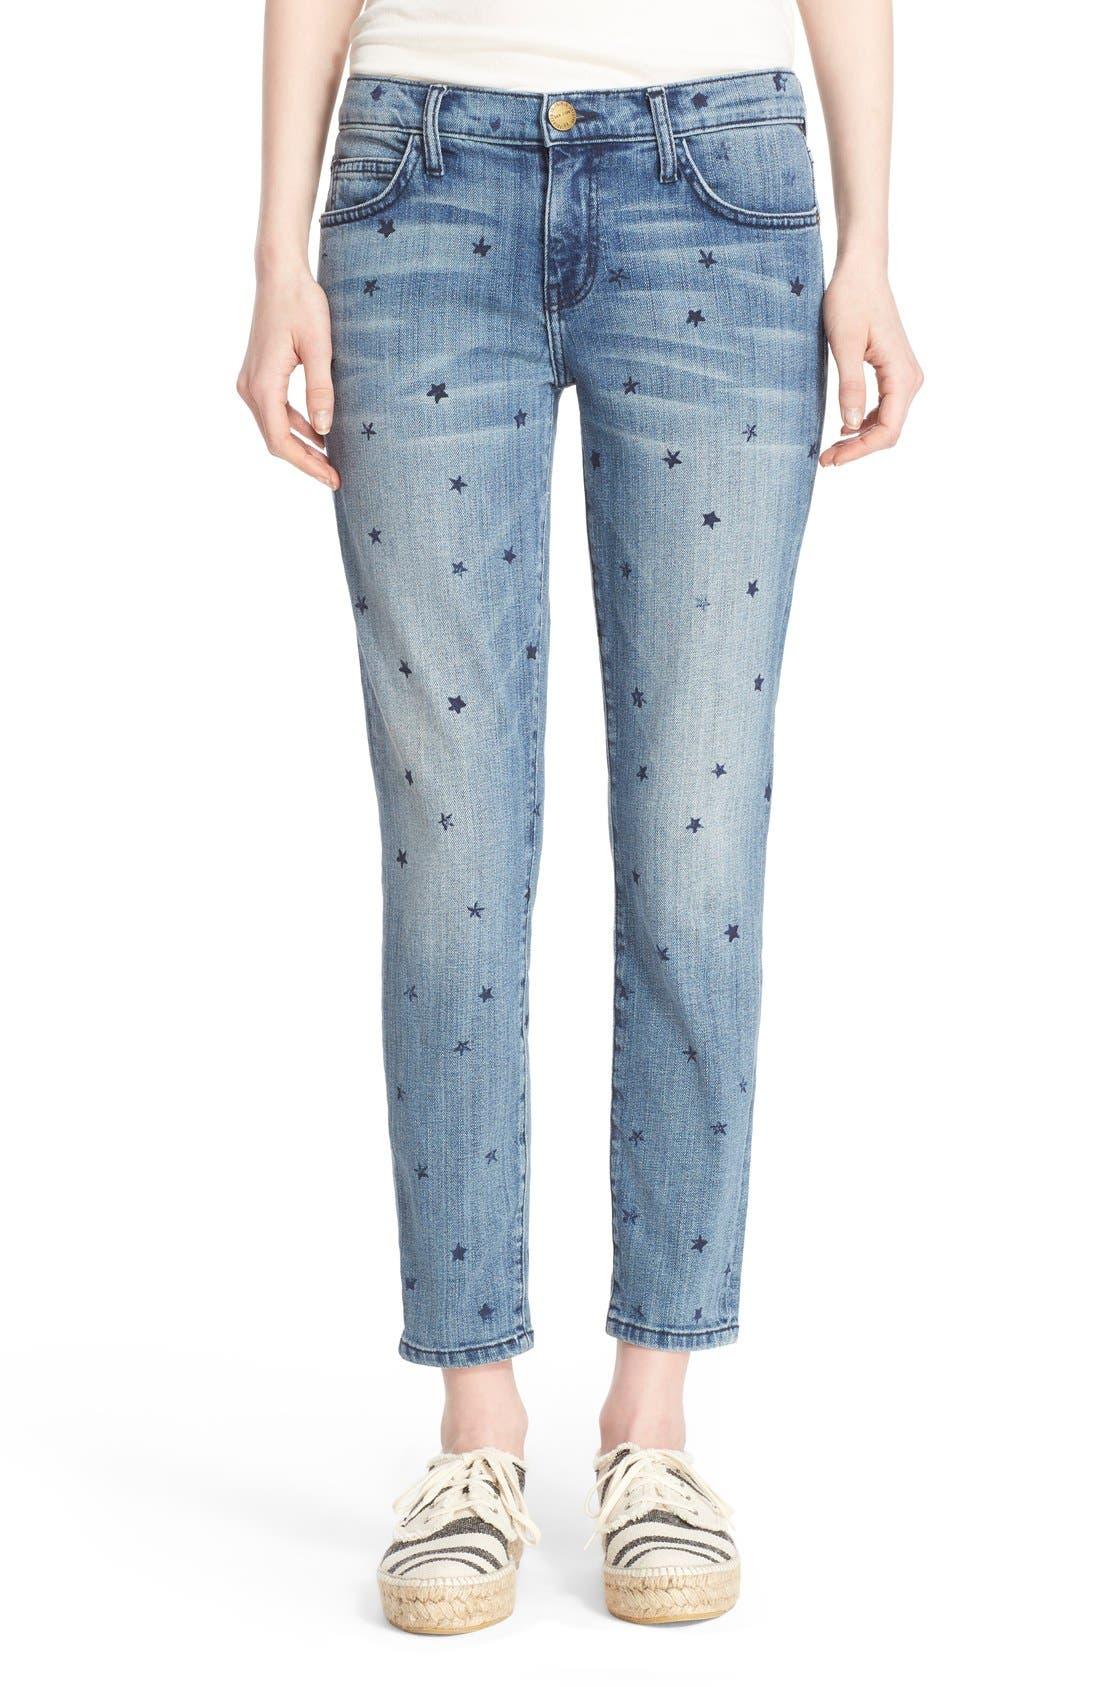 CURRENT/ELLIOTT The Stiletto Star Print Skinny Jeans